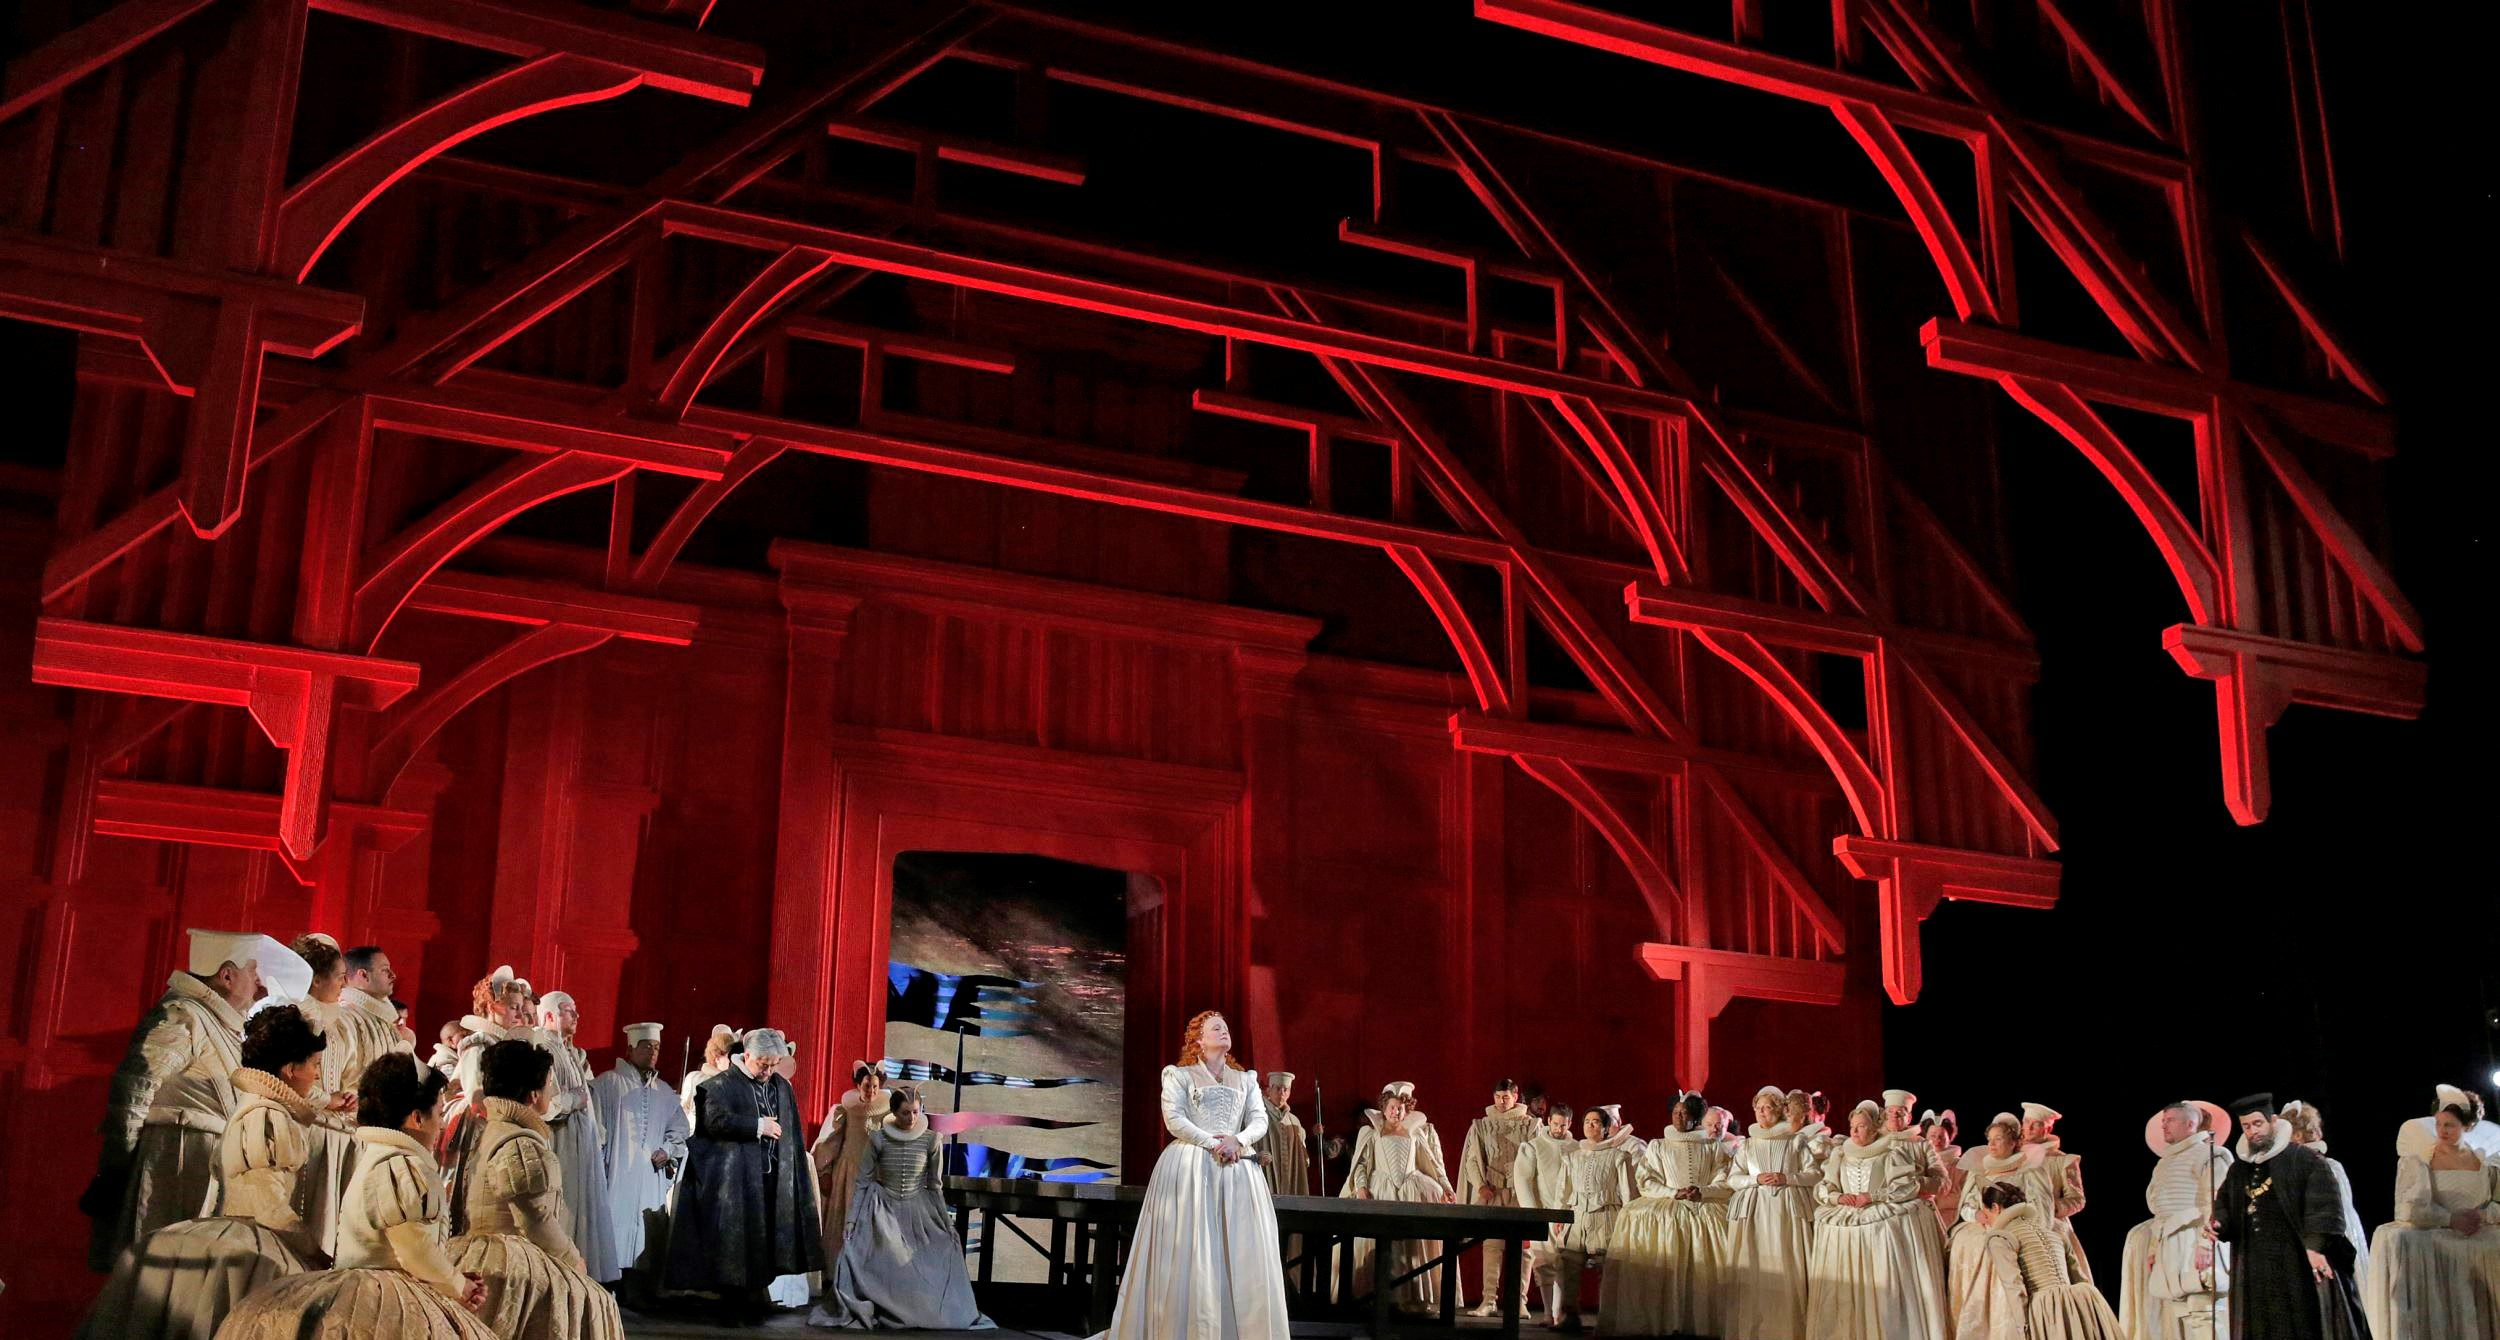 Maria Stuarda Donizetti tragedia donne